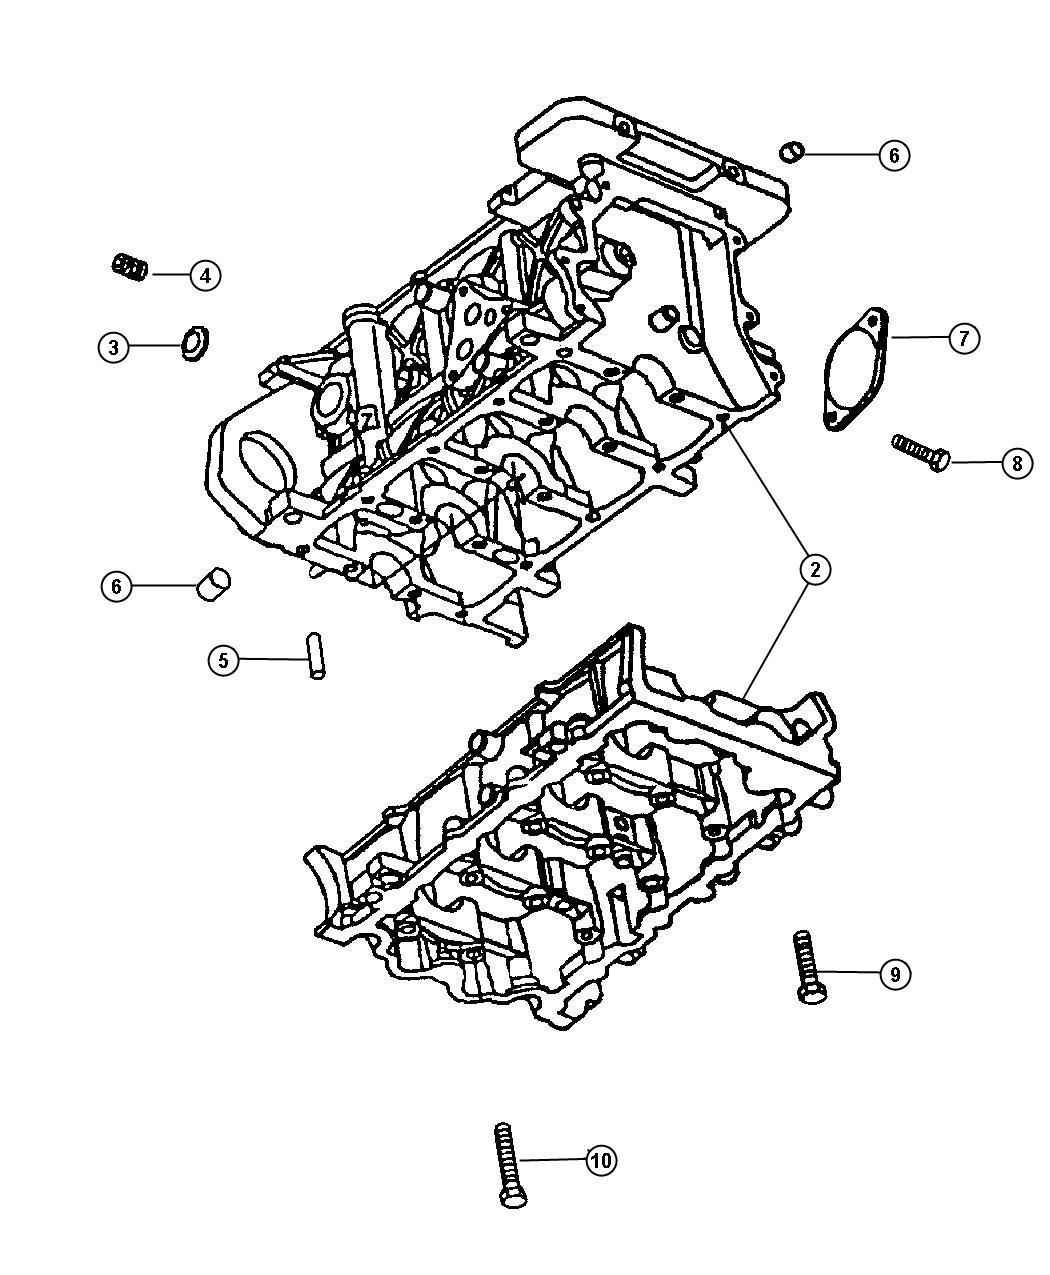 1997 Dodge Intrepid Bolt. Hex head. M10x1.50x75. C/member